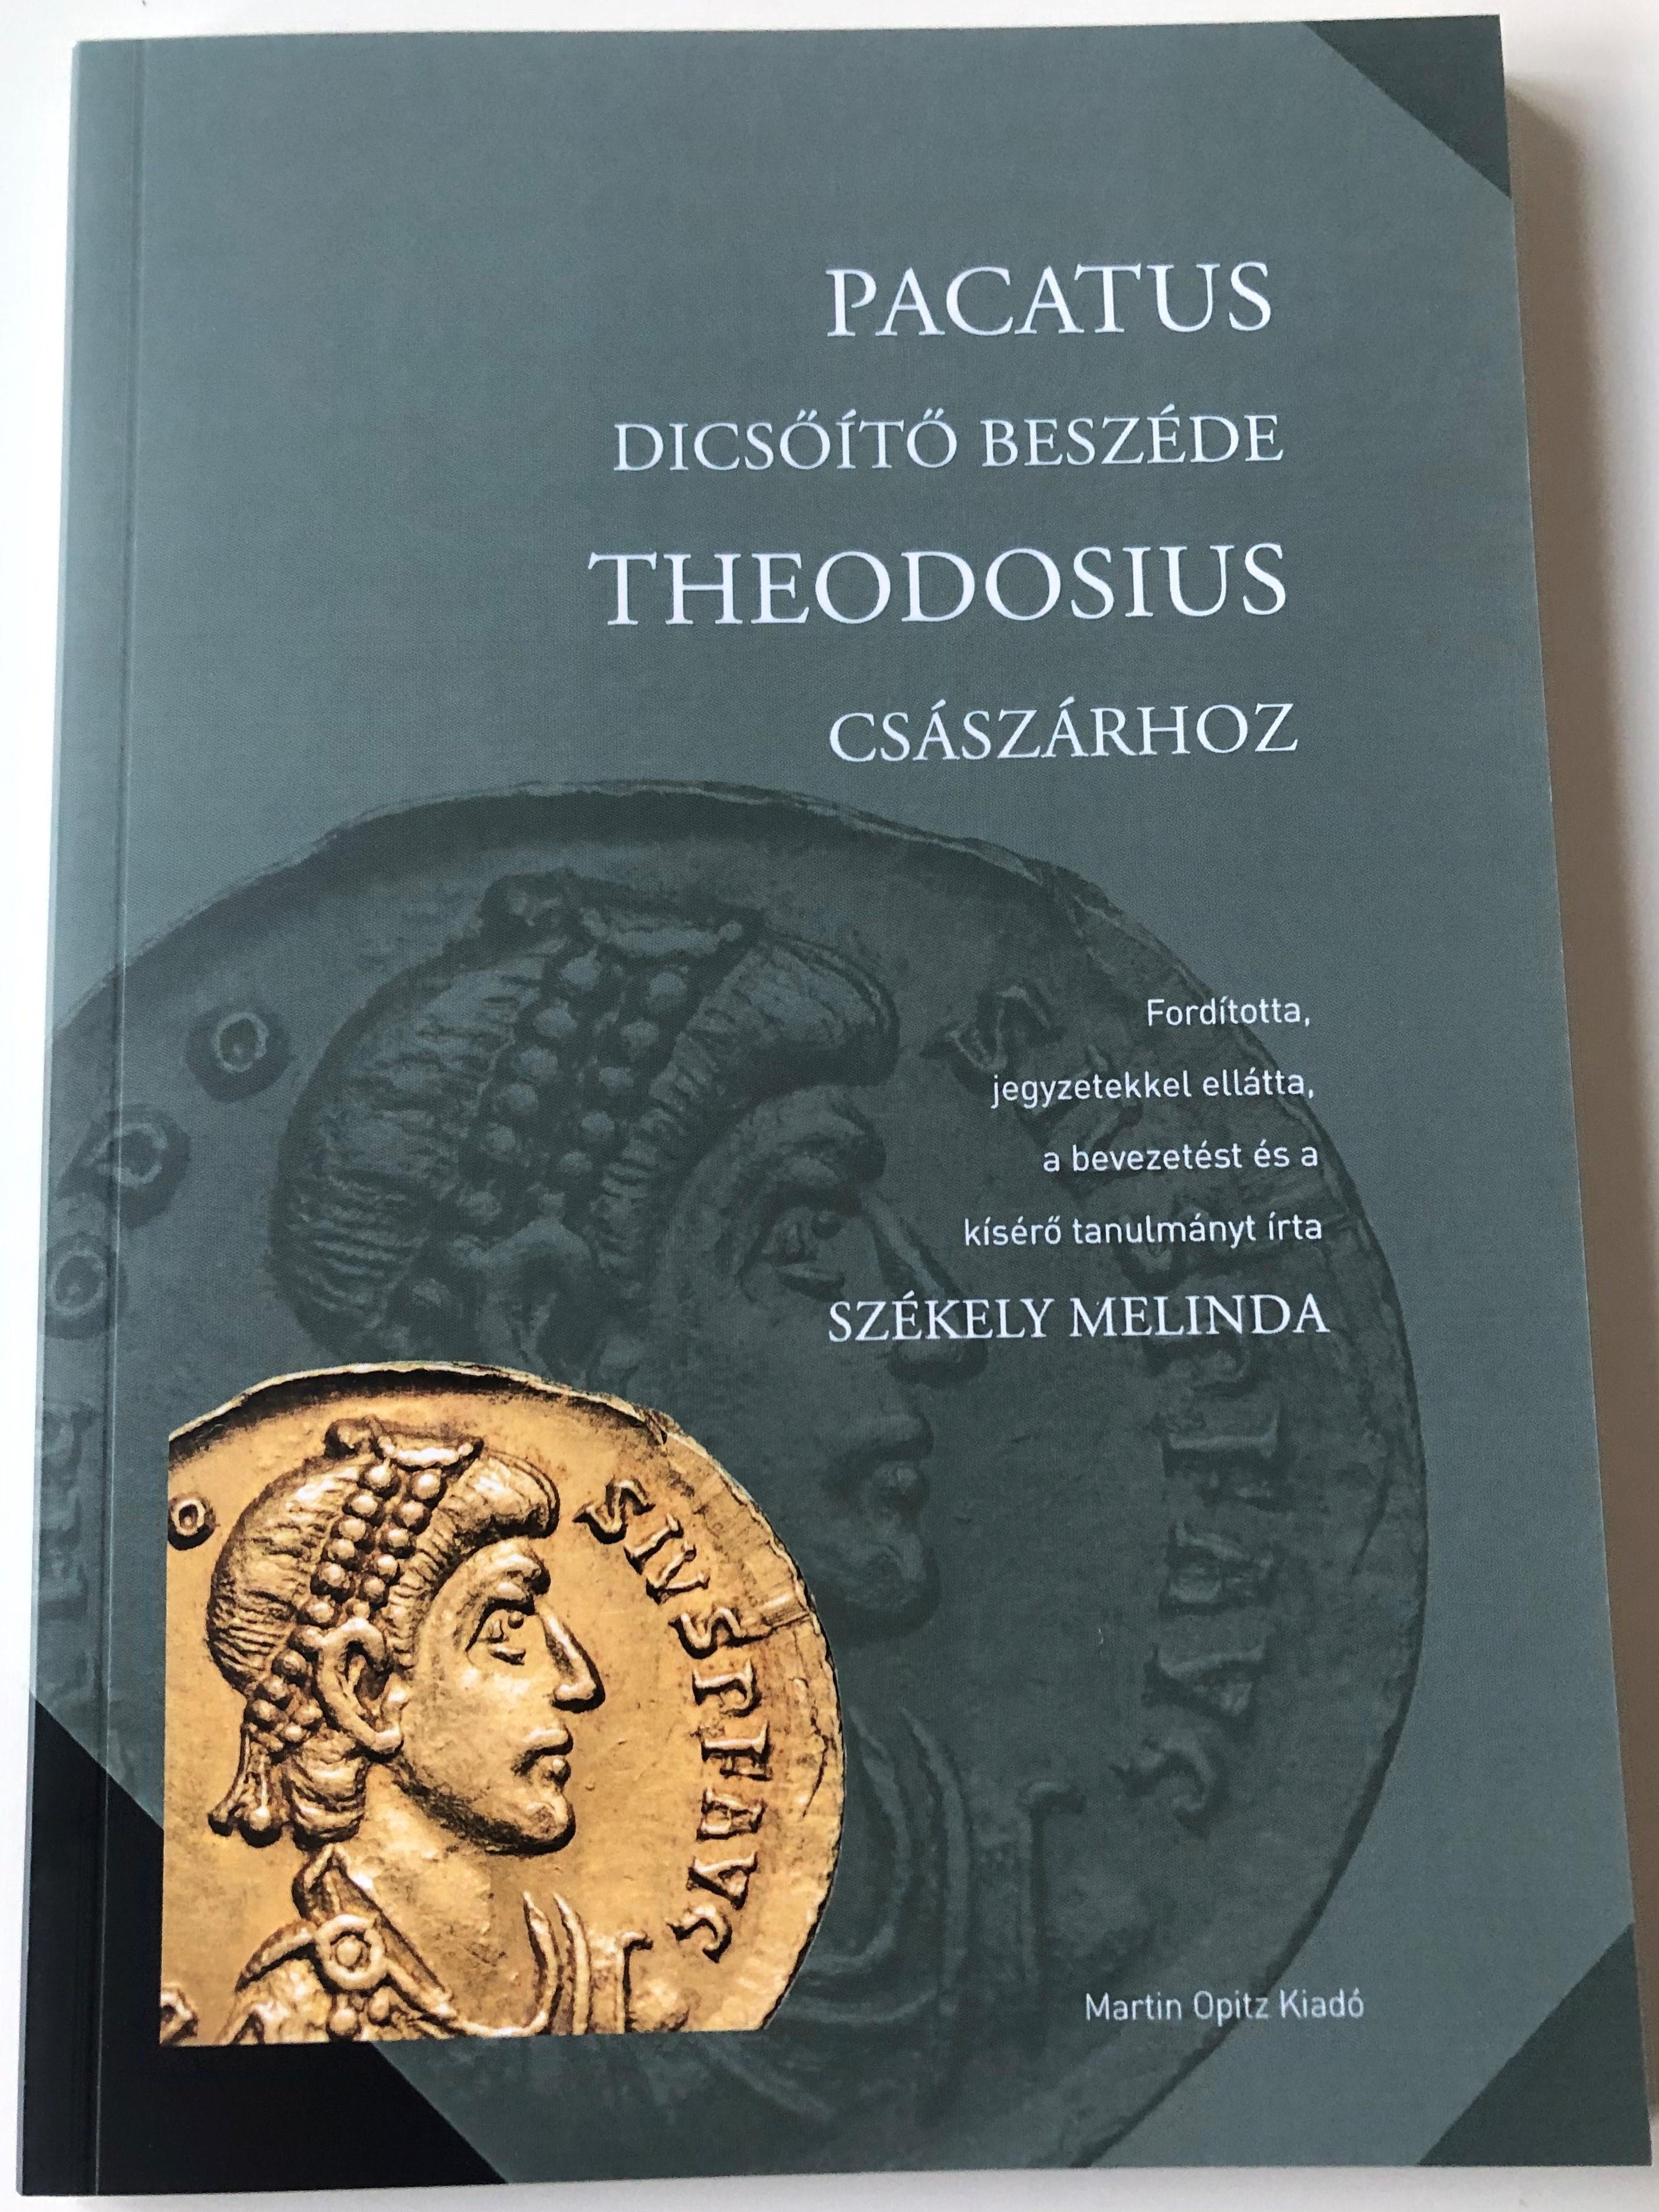 pacatus-dics-t-besz-de-theodosius-cs-sz-rhoz-by-sz-kely-melinda-1.jpg